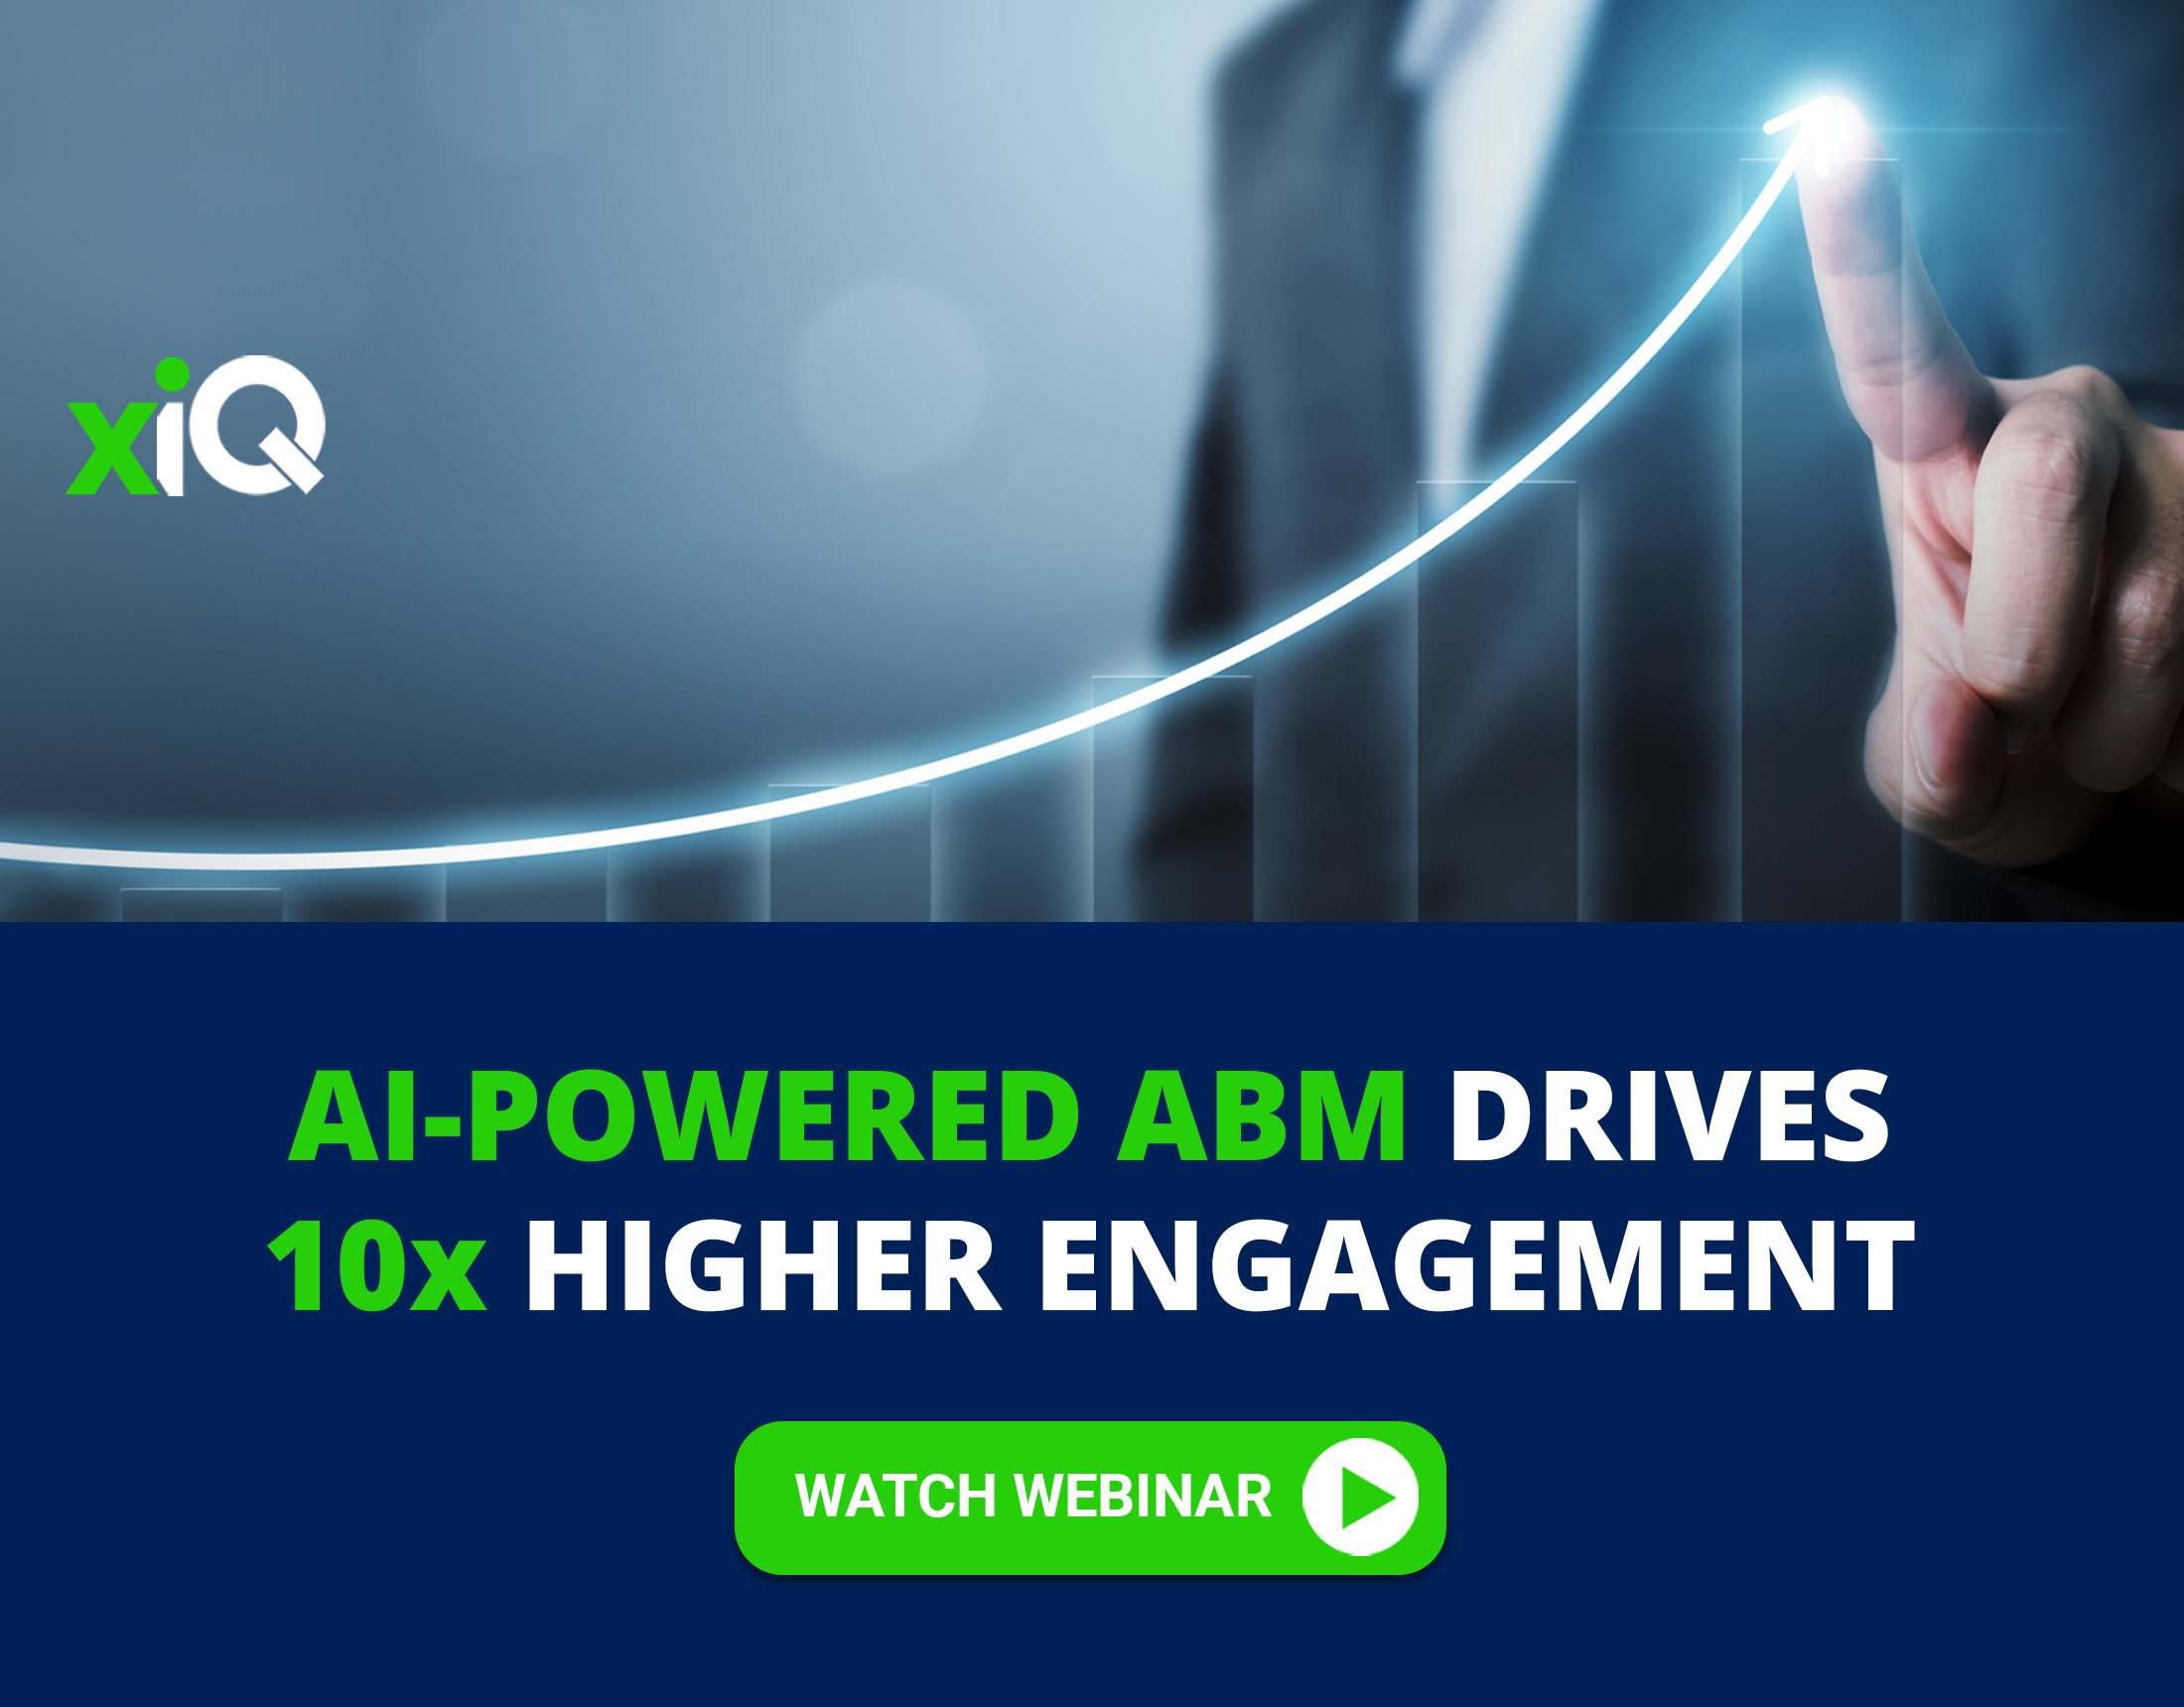 AI-powered ABM Drives 10x Higher Engagement